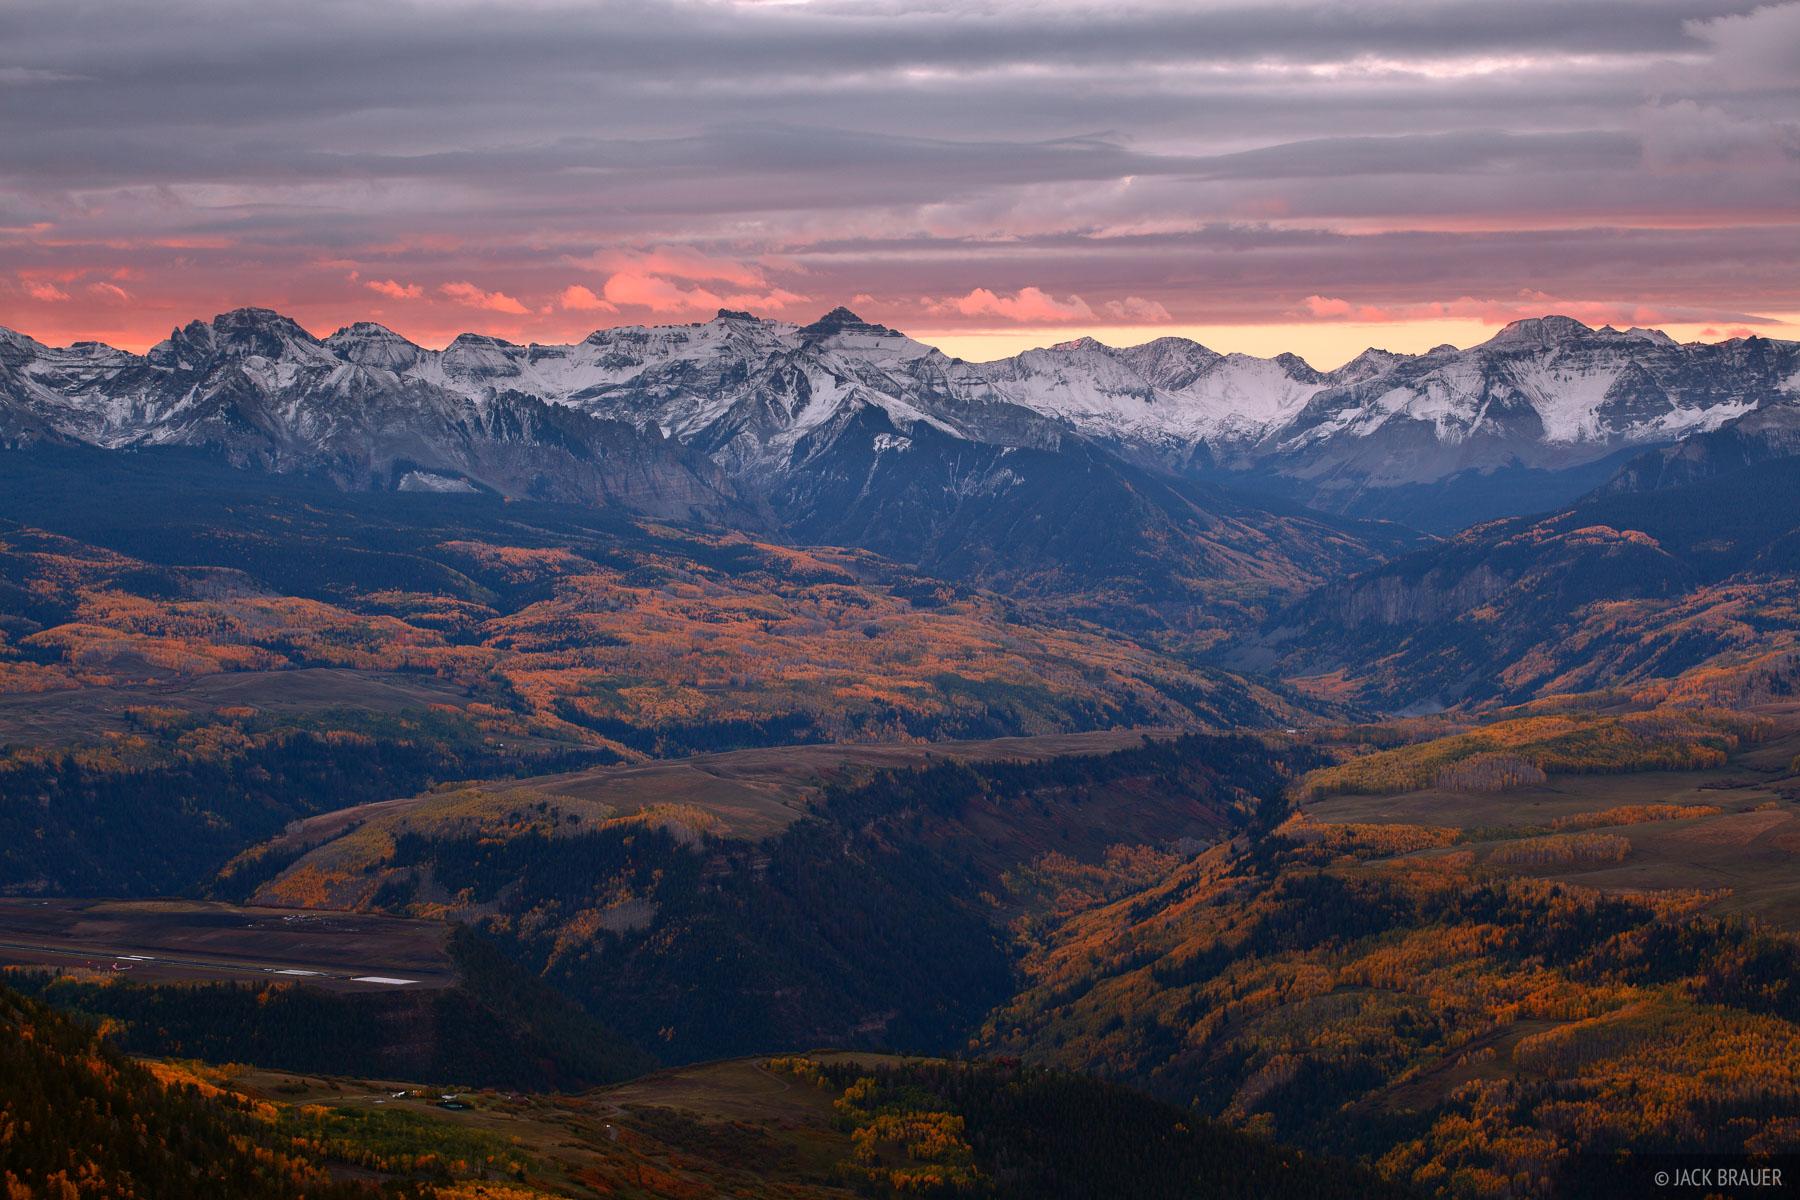 Silver Mountain, Yellow Mountain, Ophir, Telluride, San Juan Mountains, Colorado, sunrise, photo